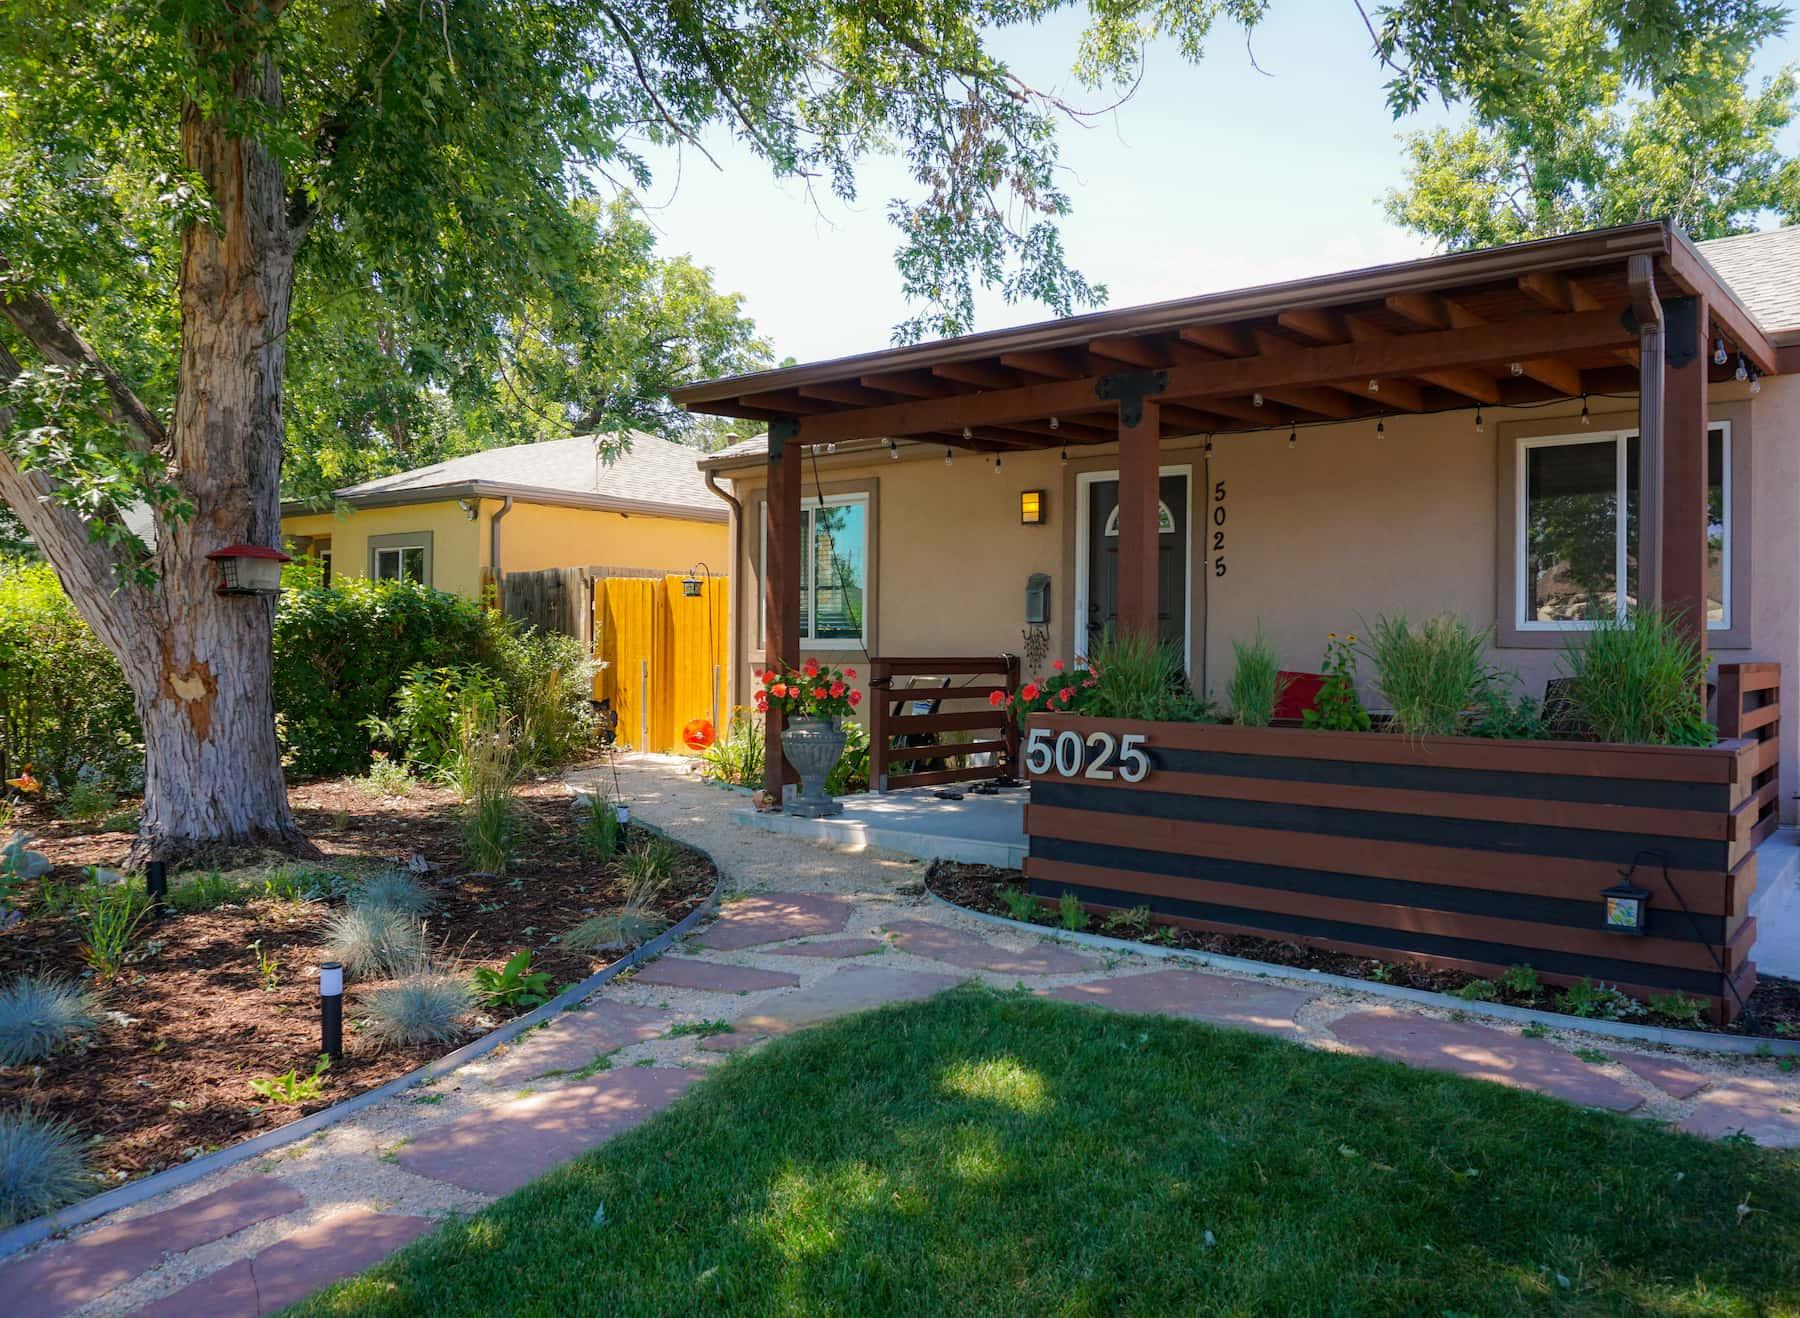 Pergola Porch Awning Landscaping Sunnyside Denver CO